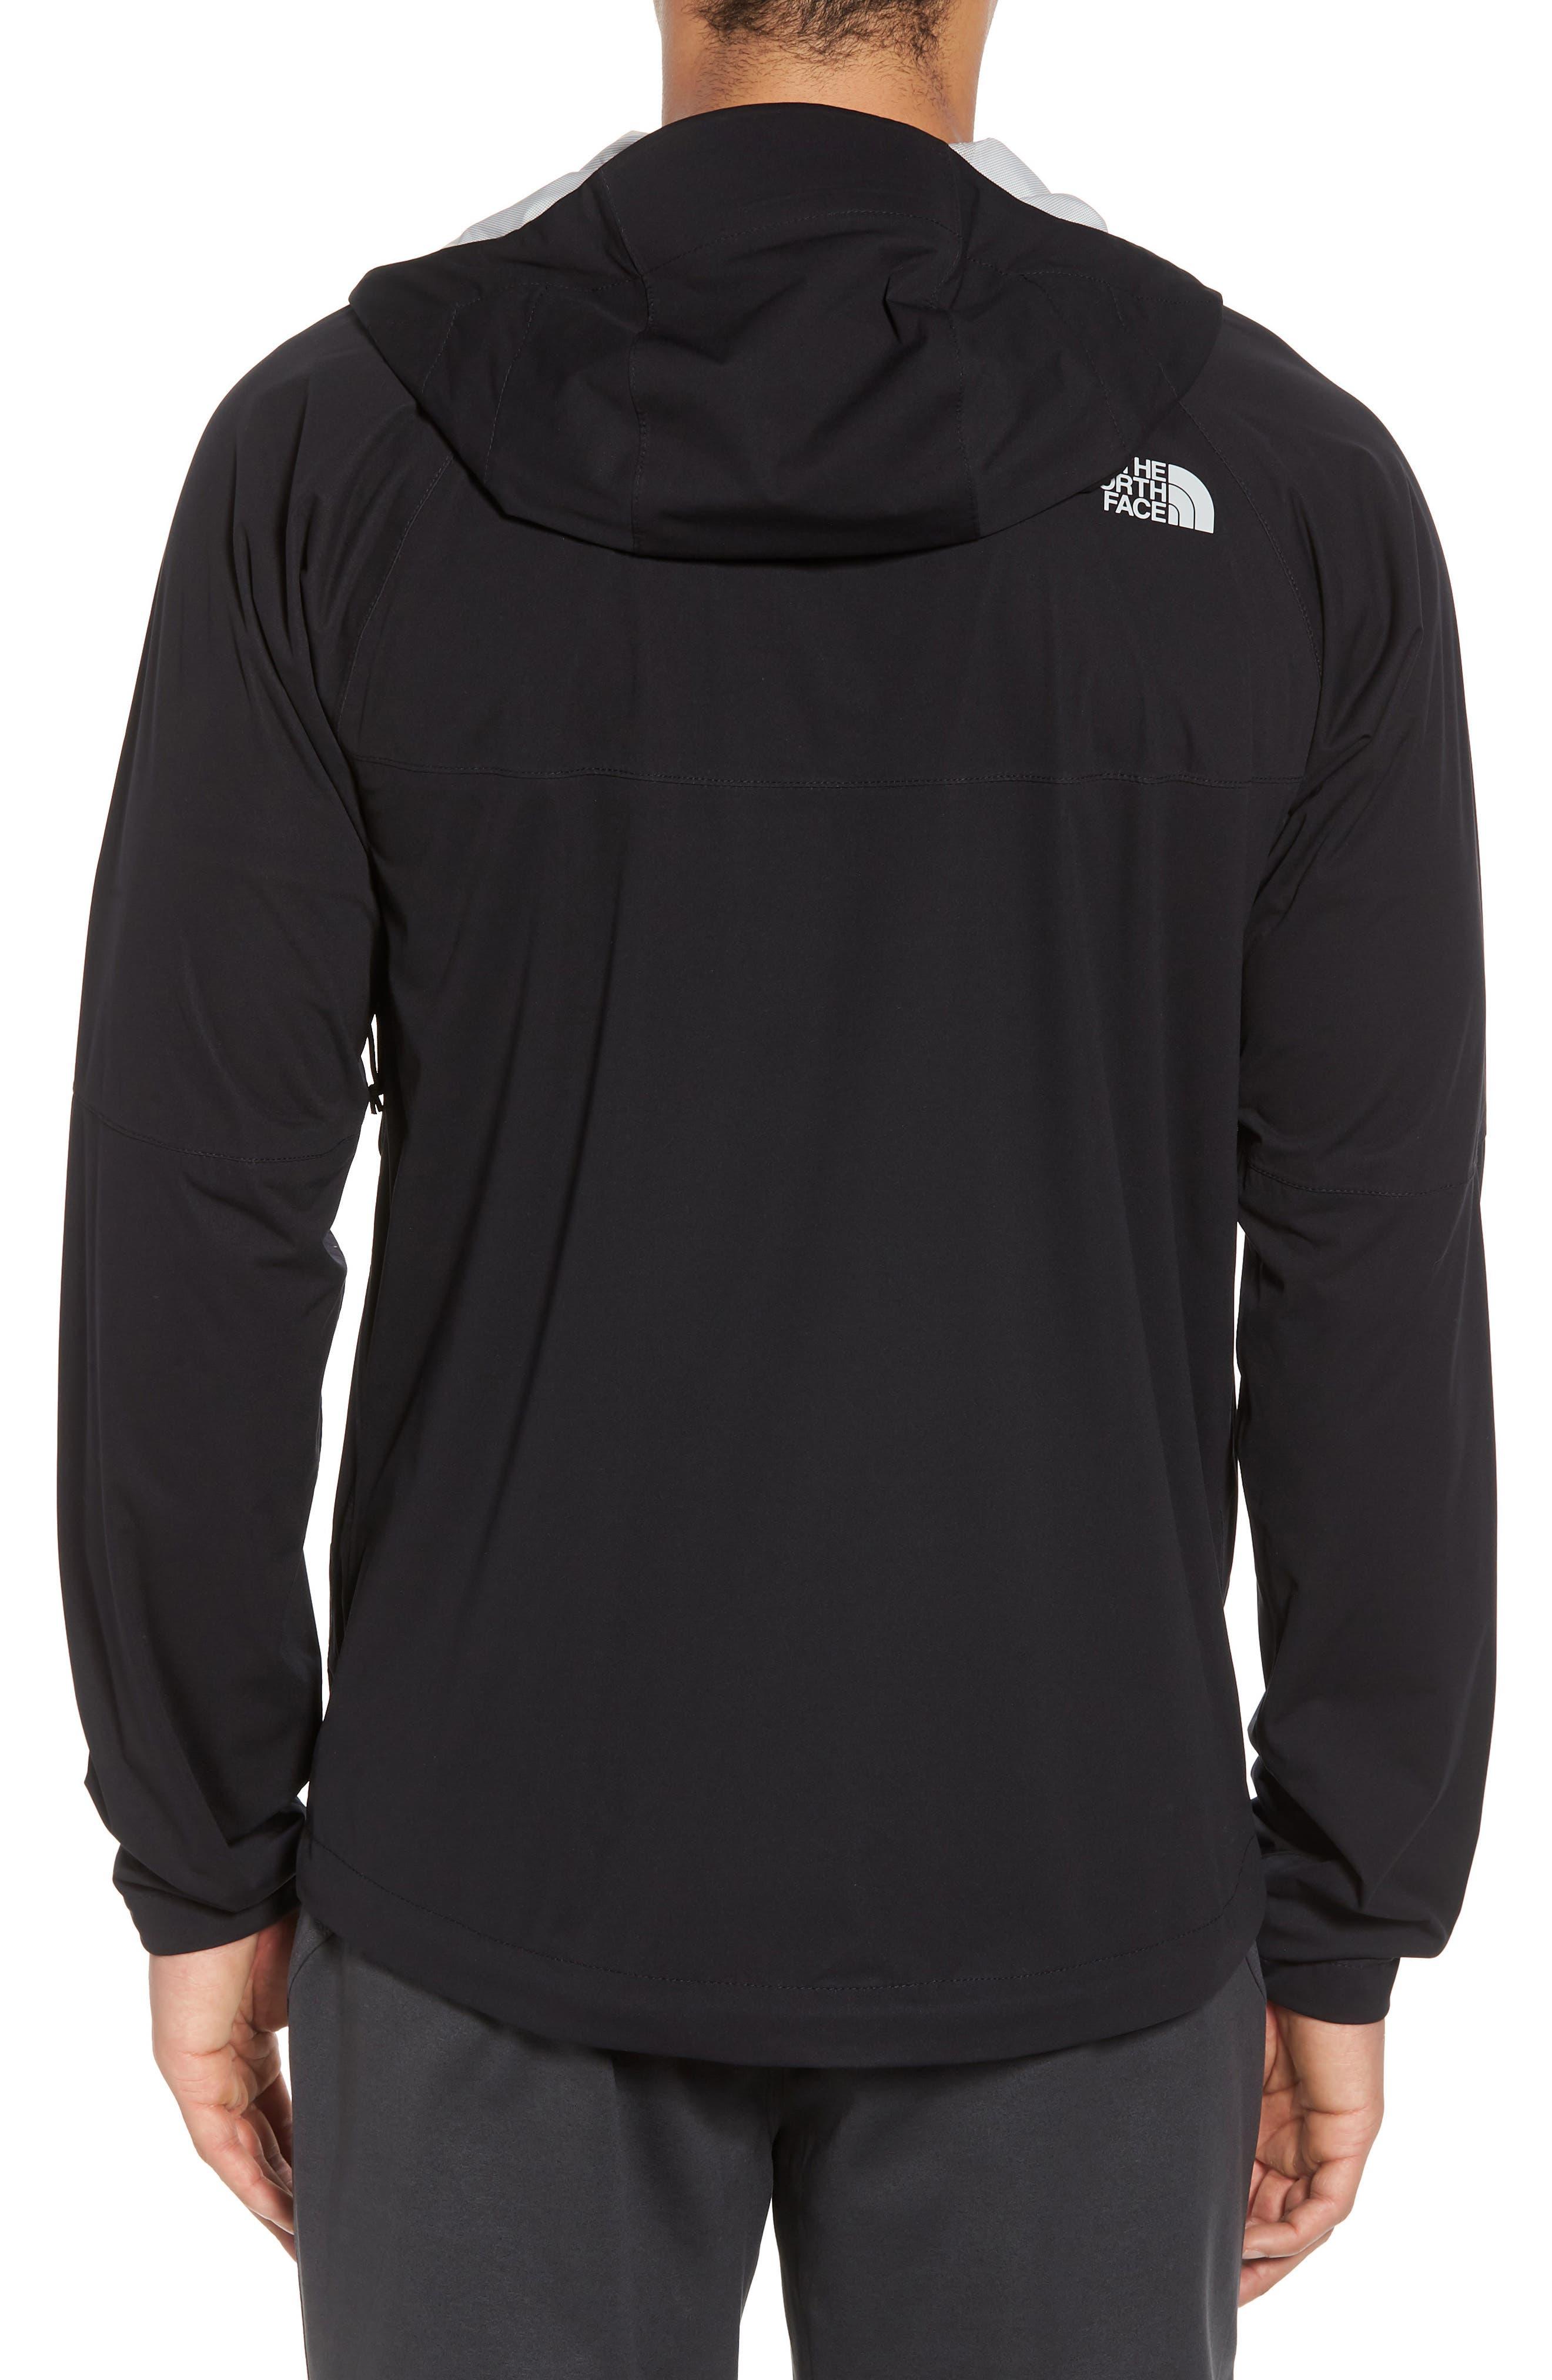 Allproof Stretch Hooded Rain Jacket,                             Alternate thumbnail 2, color,                             TNF BLACK